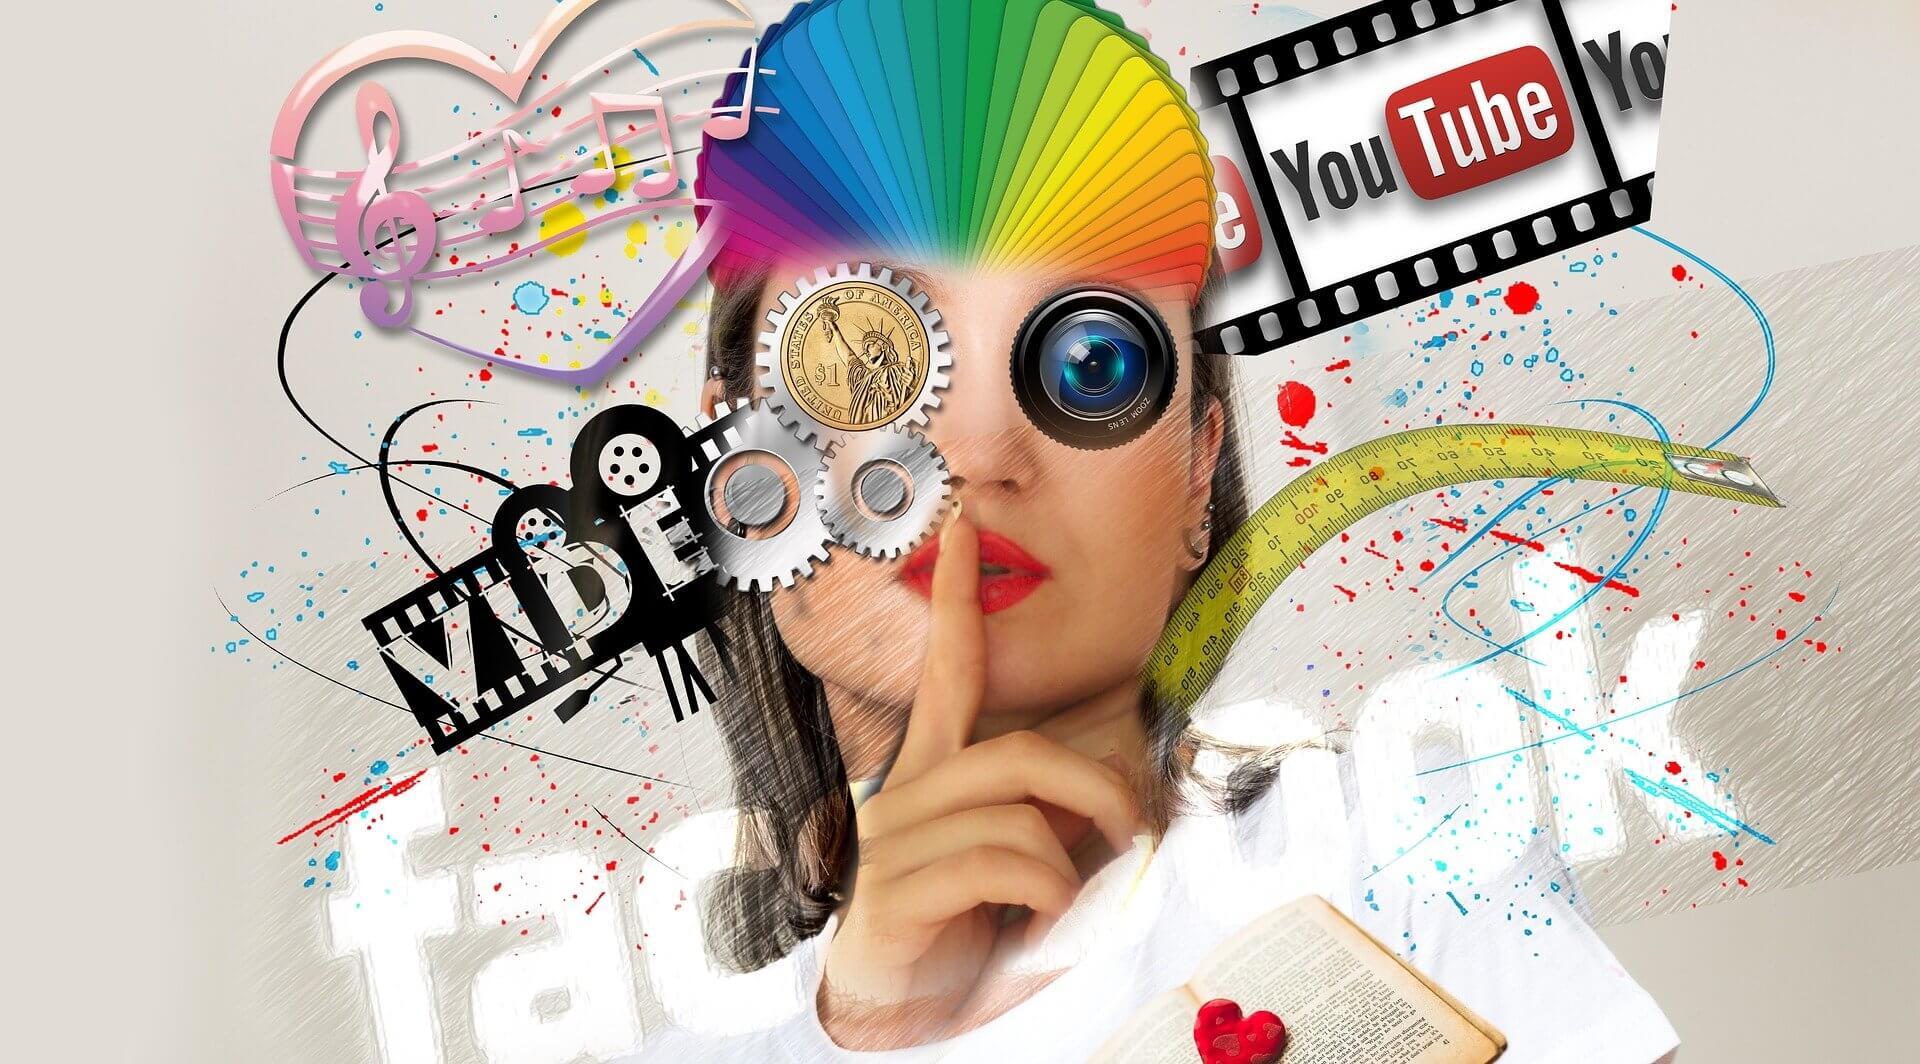 digitalprashantk.com